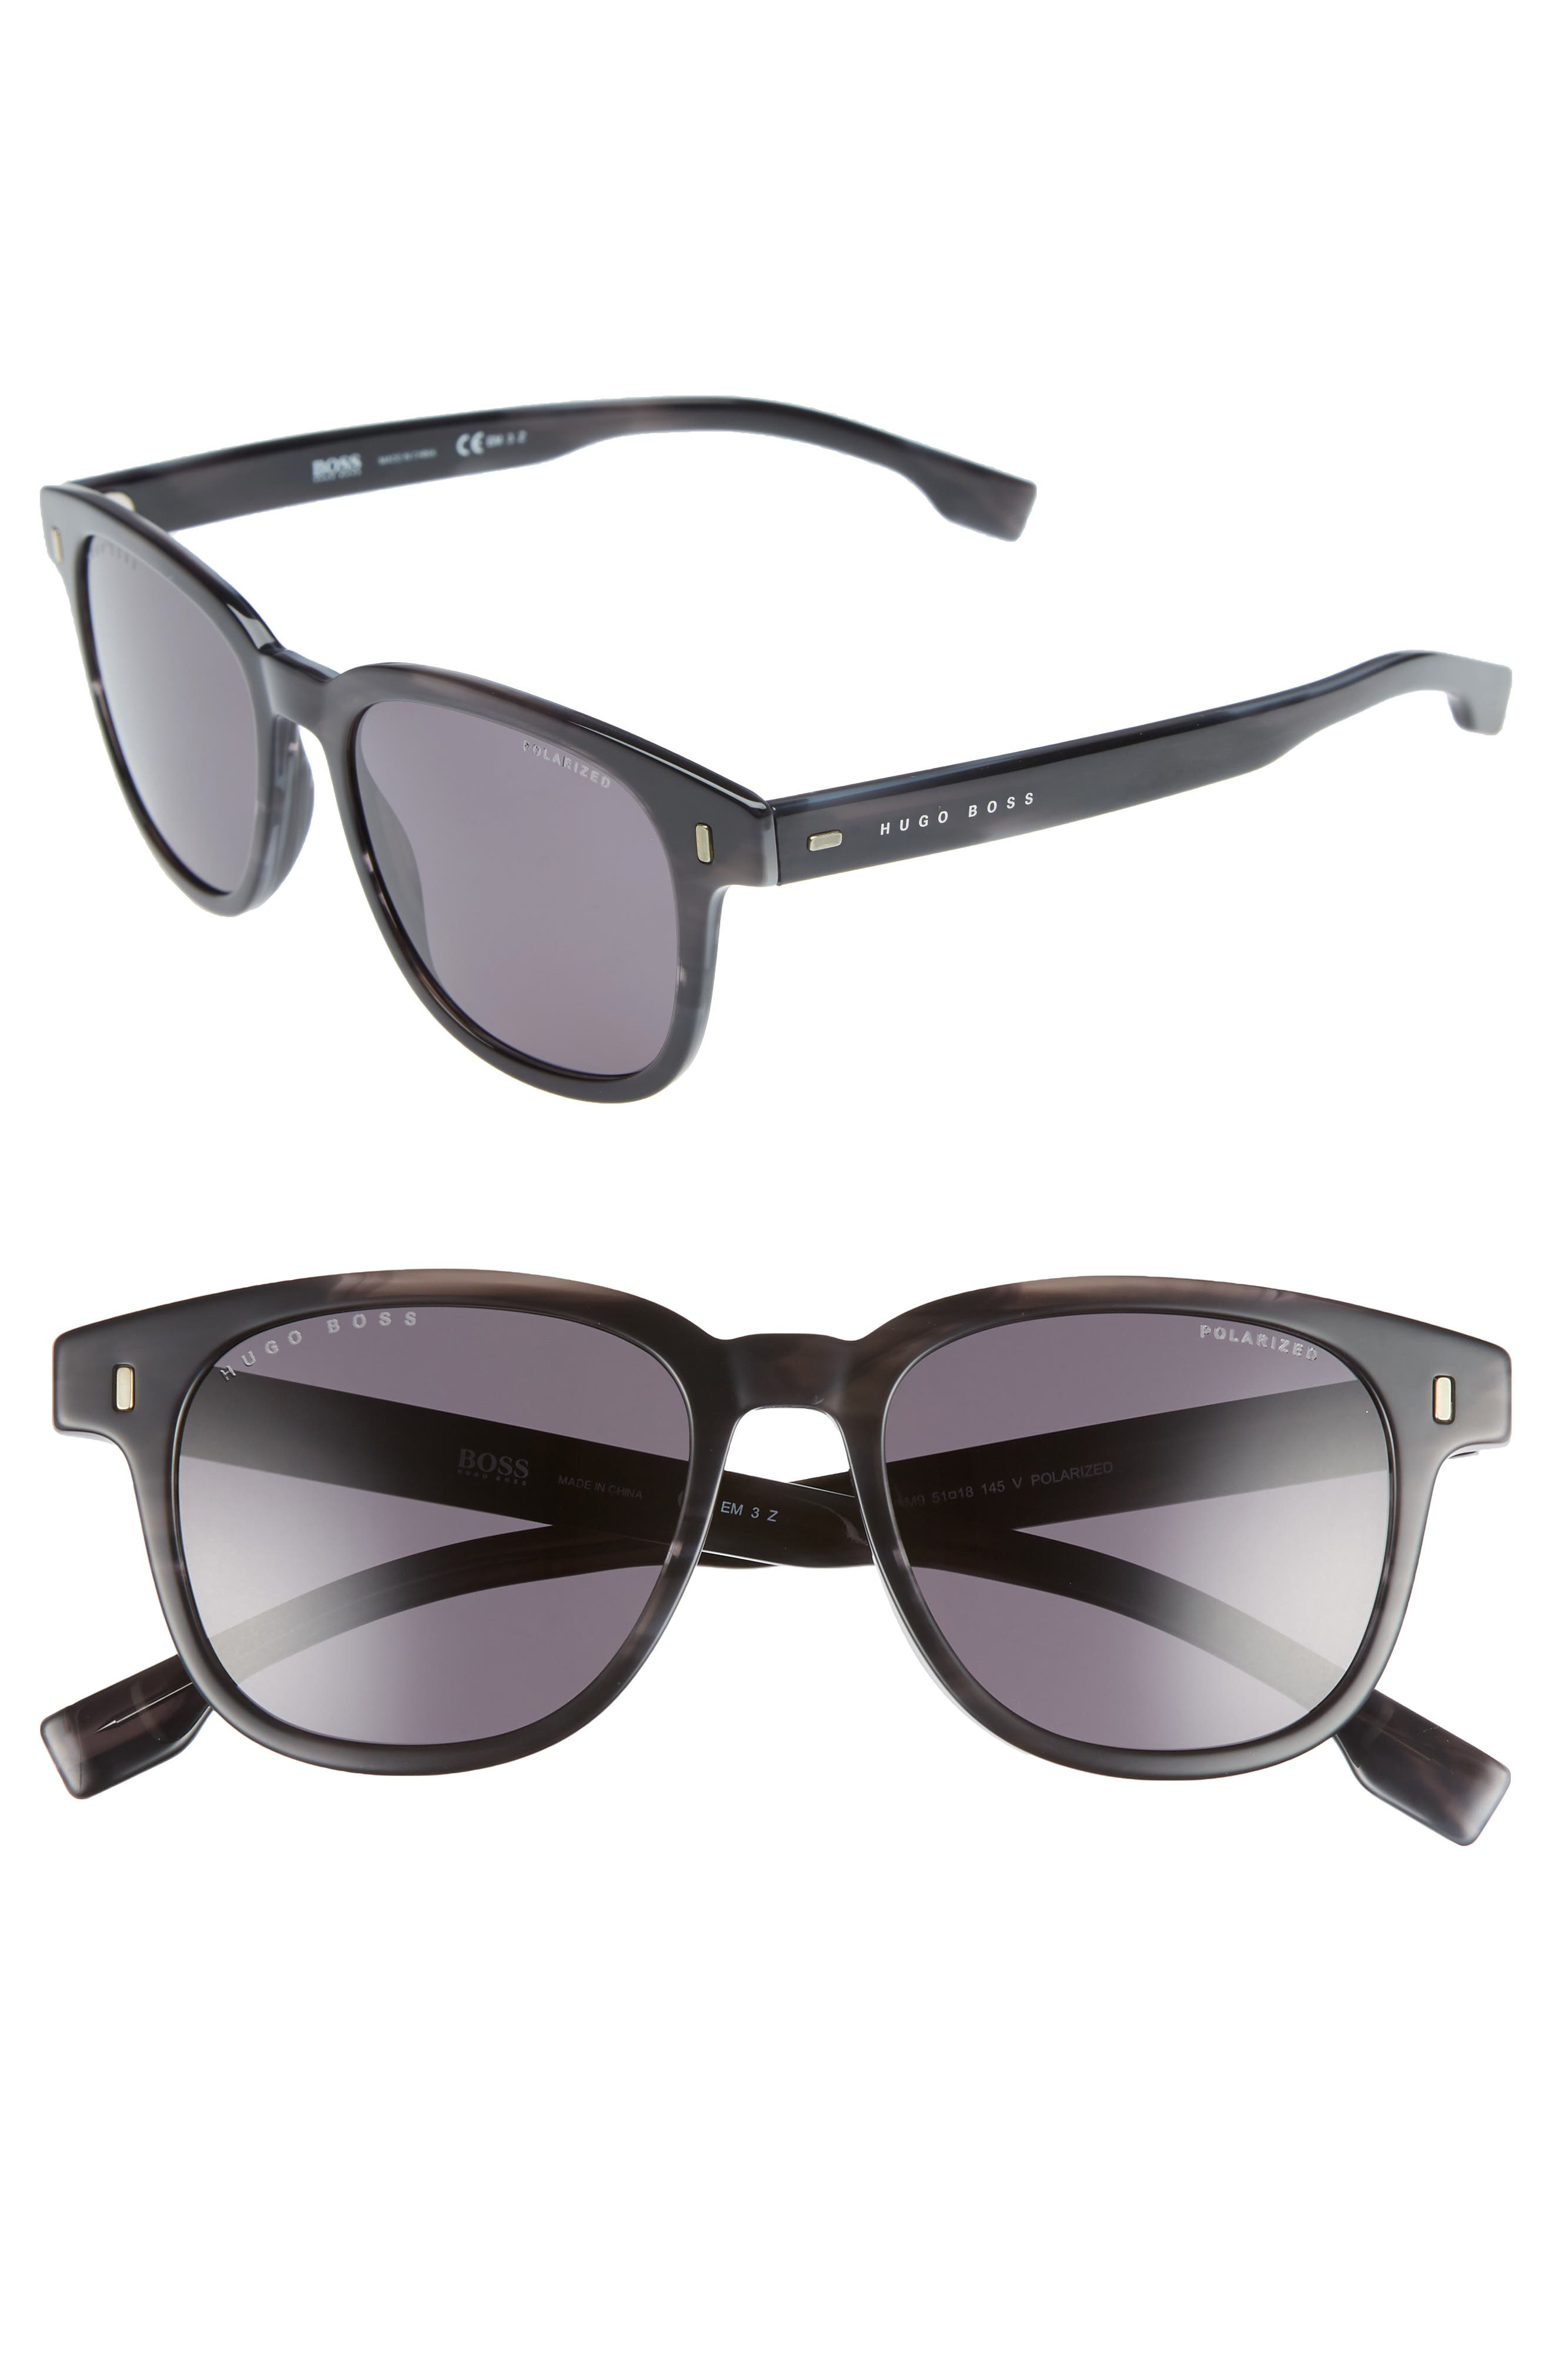 Core 51mm Polarized Sunglasses,                         Main,                         color, GREY HORN/ POLAR